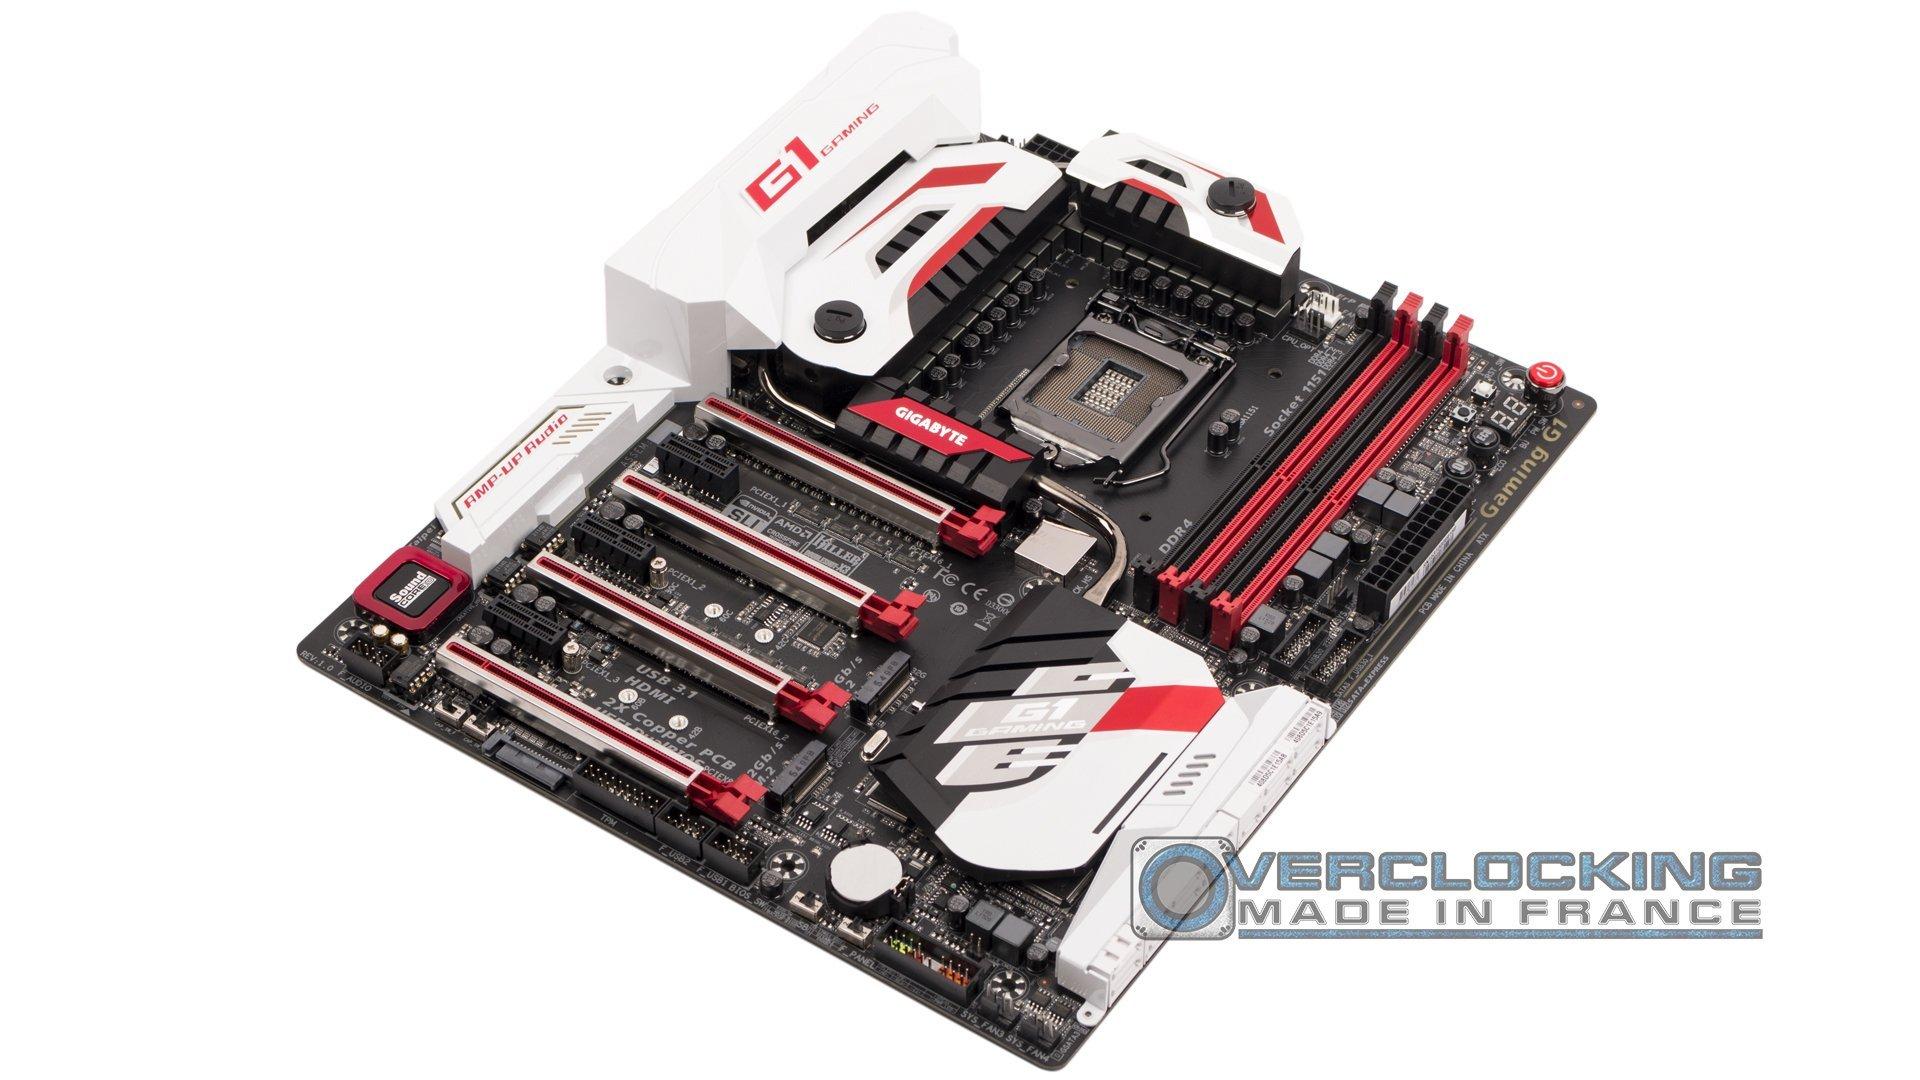 Gigabyte Z170X Gaming G1 9